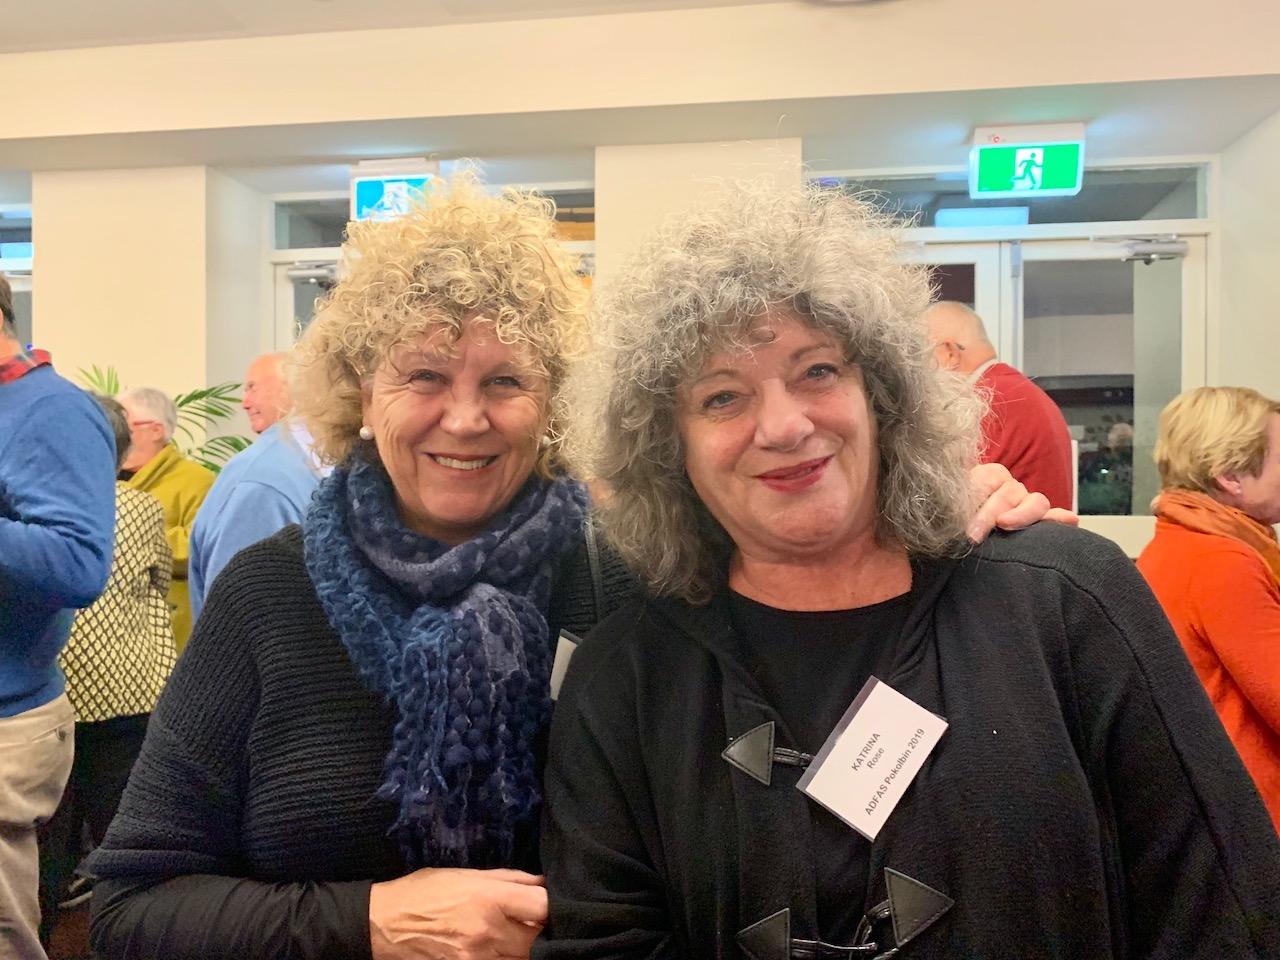 Sandra McElwee & Katrina Rose